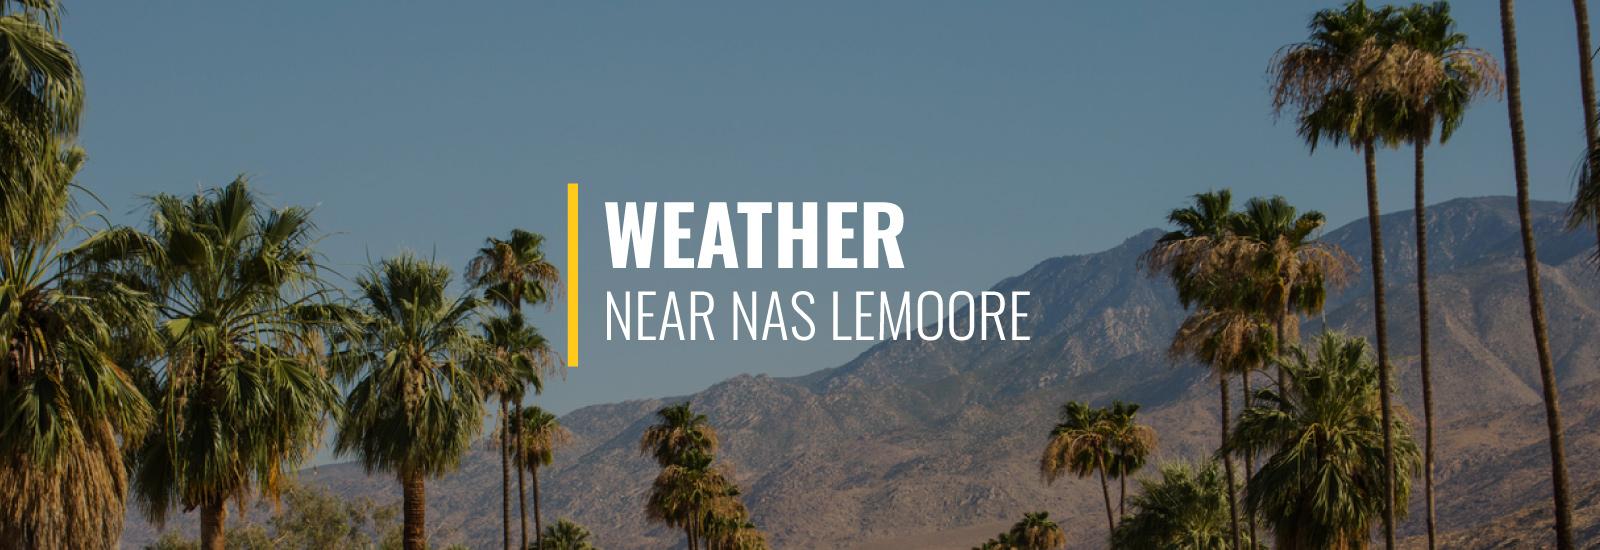 NAS Lemoore Weather